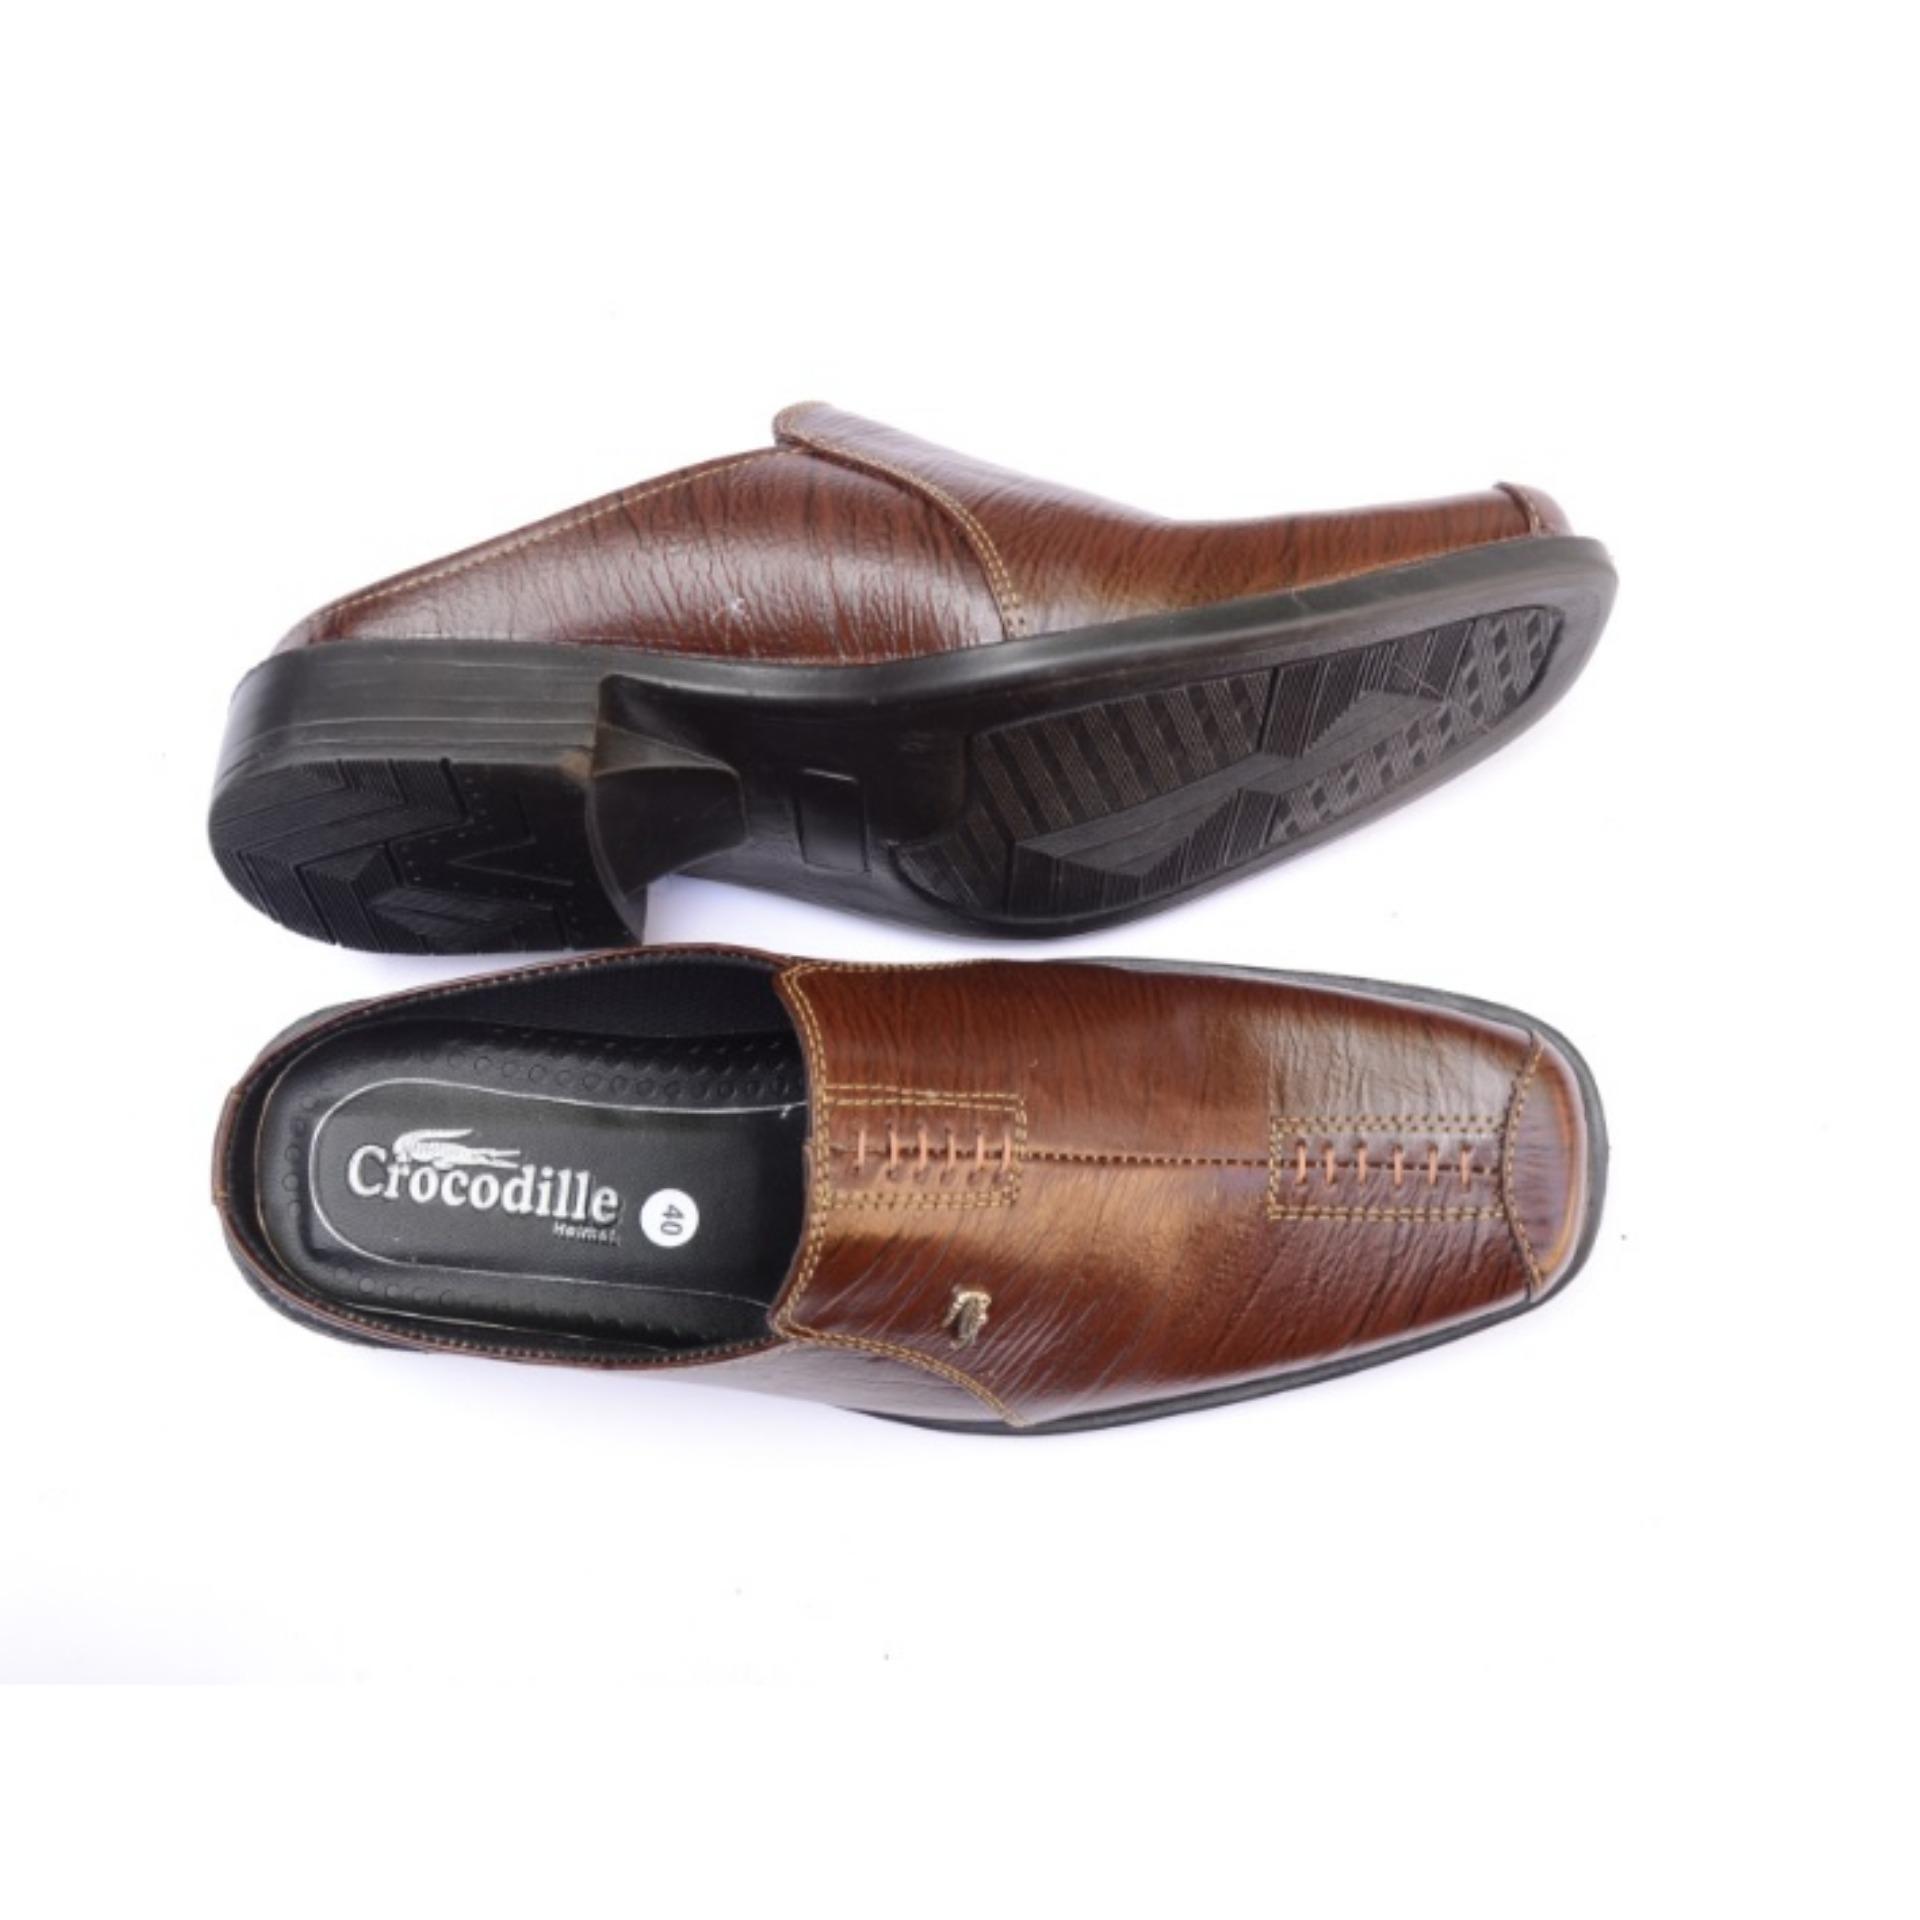 Crocodile Sepatu Sandal Selop Pria Kulit Bahan Kukit Sapi Asli Fd 1